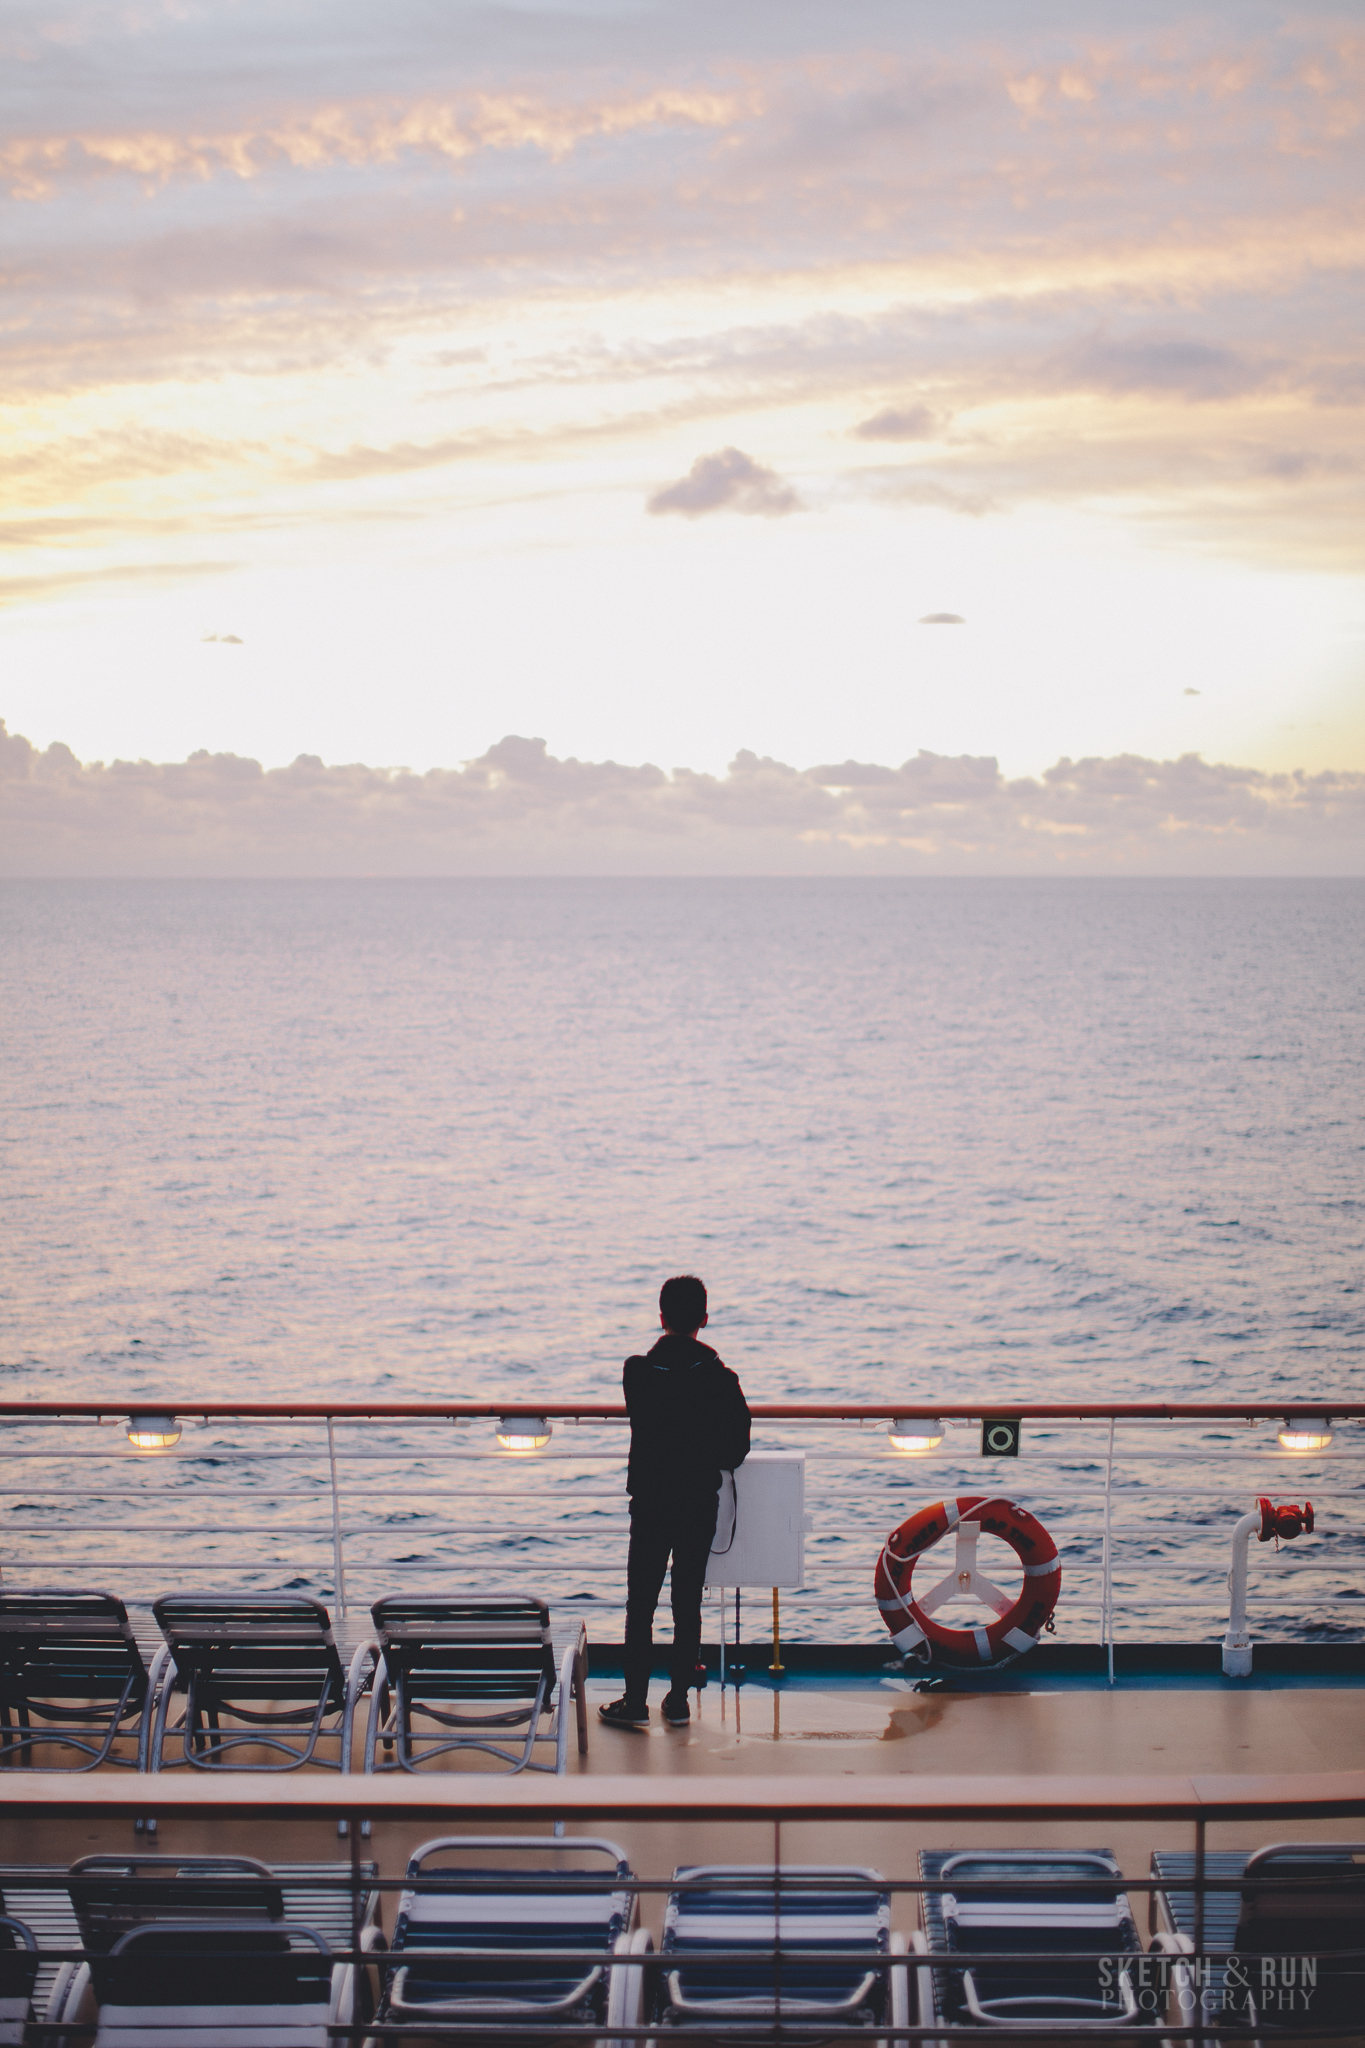 sunrise, ocean, pacific, cruise, explorer of the seas, royal caribbean